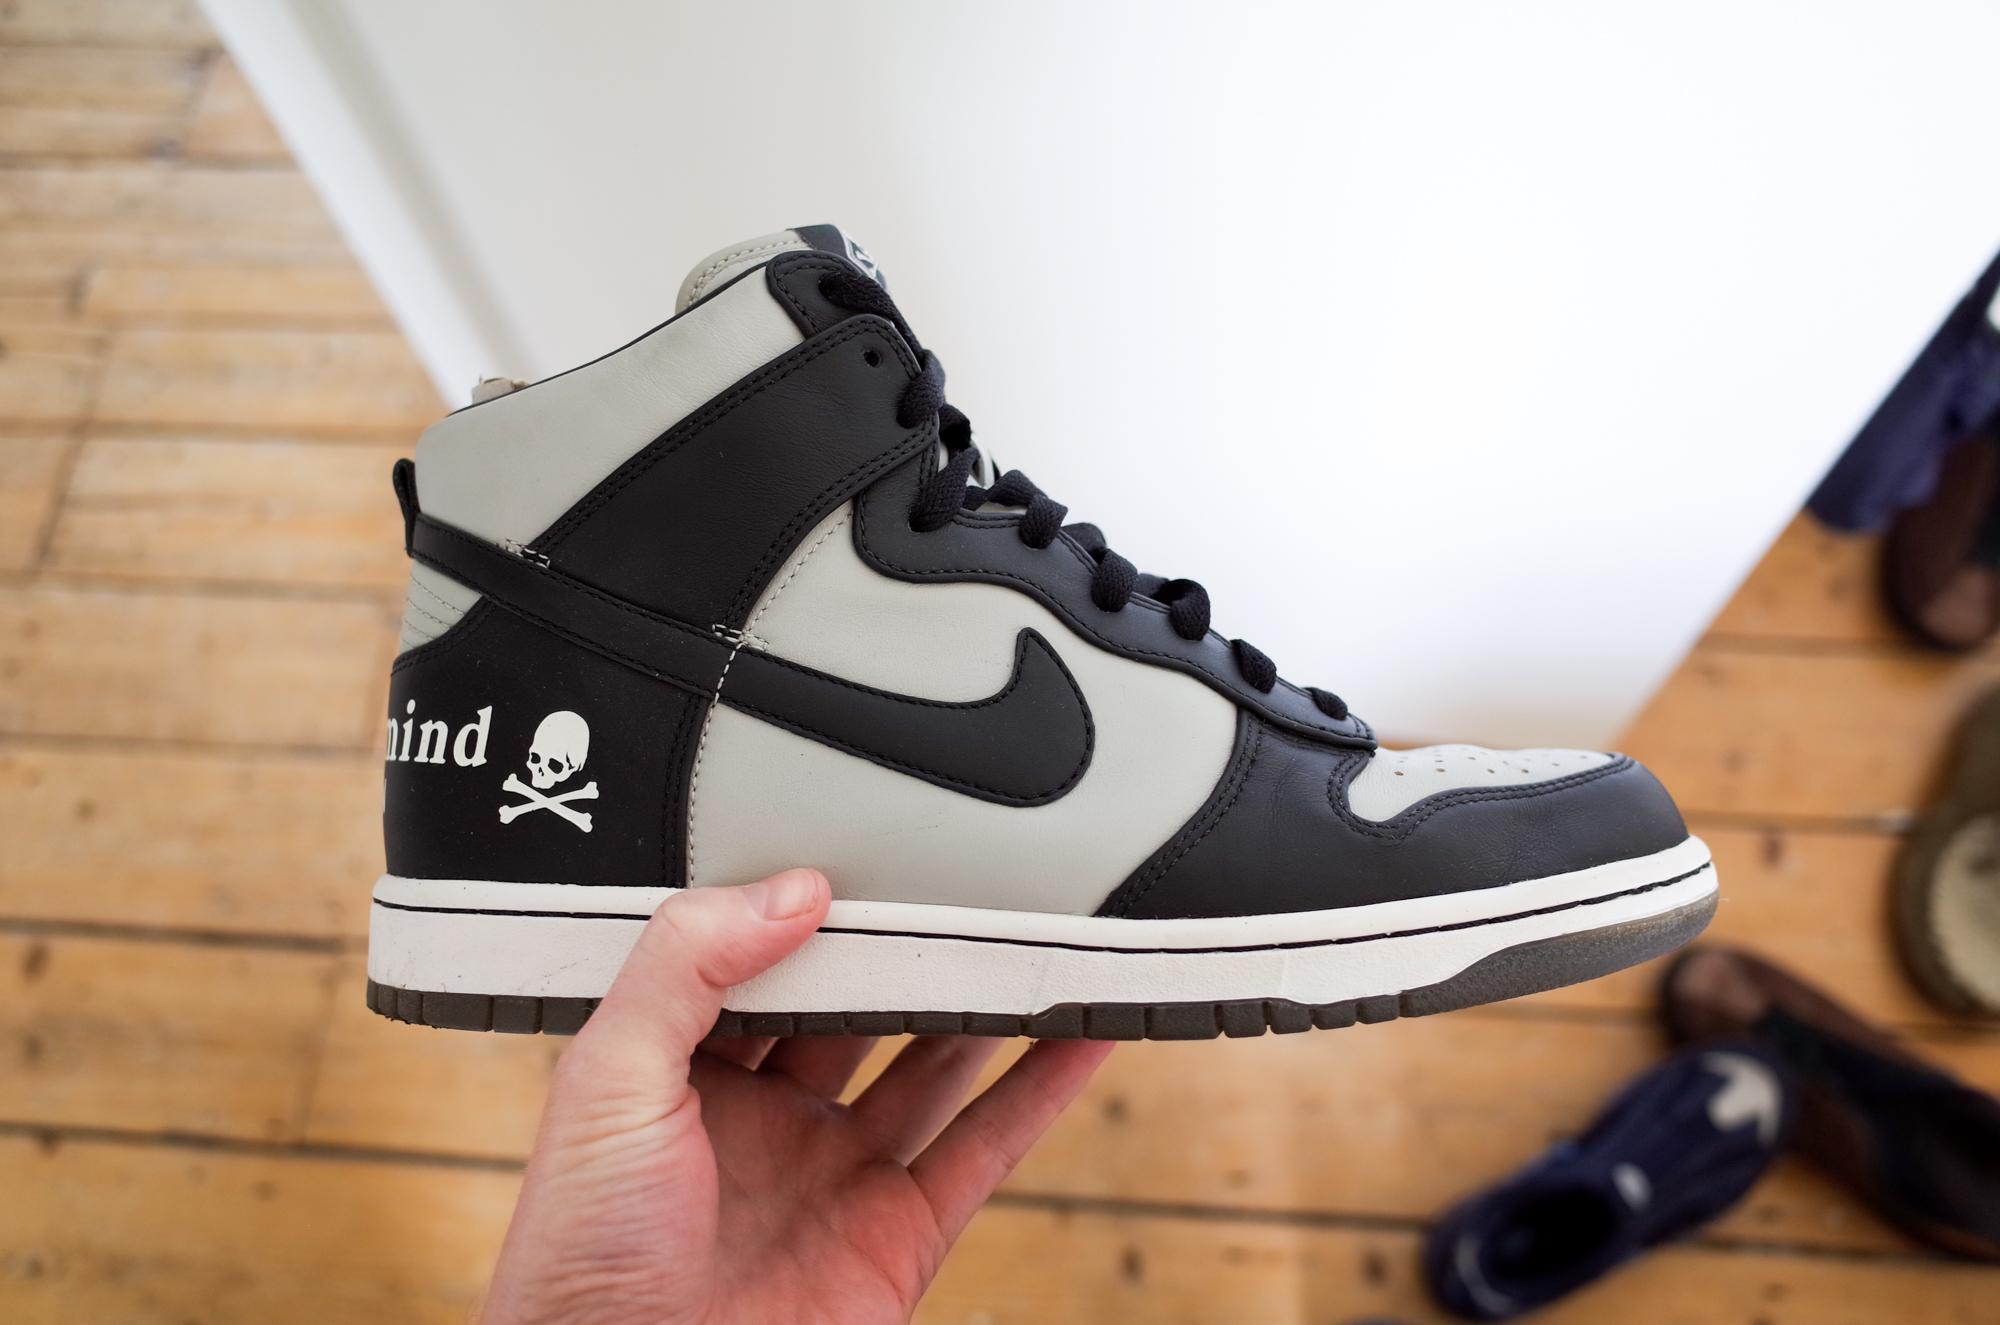 Mastermind x Nike Dunk High - 2012